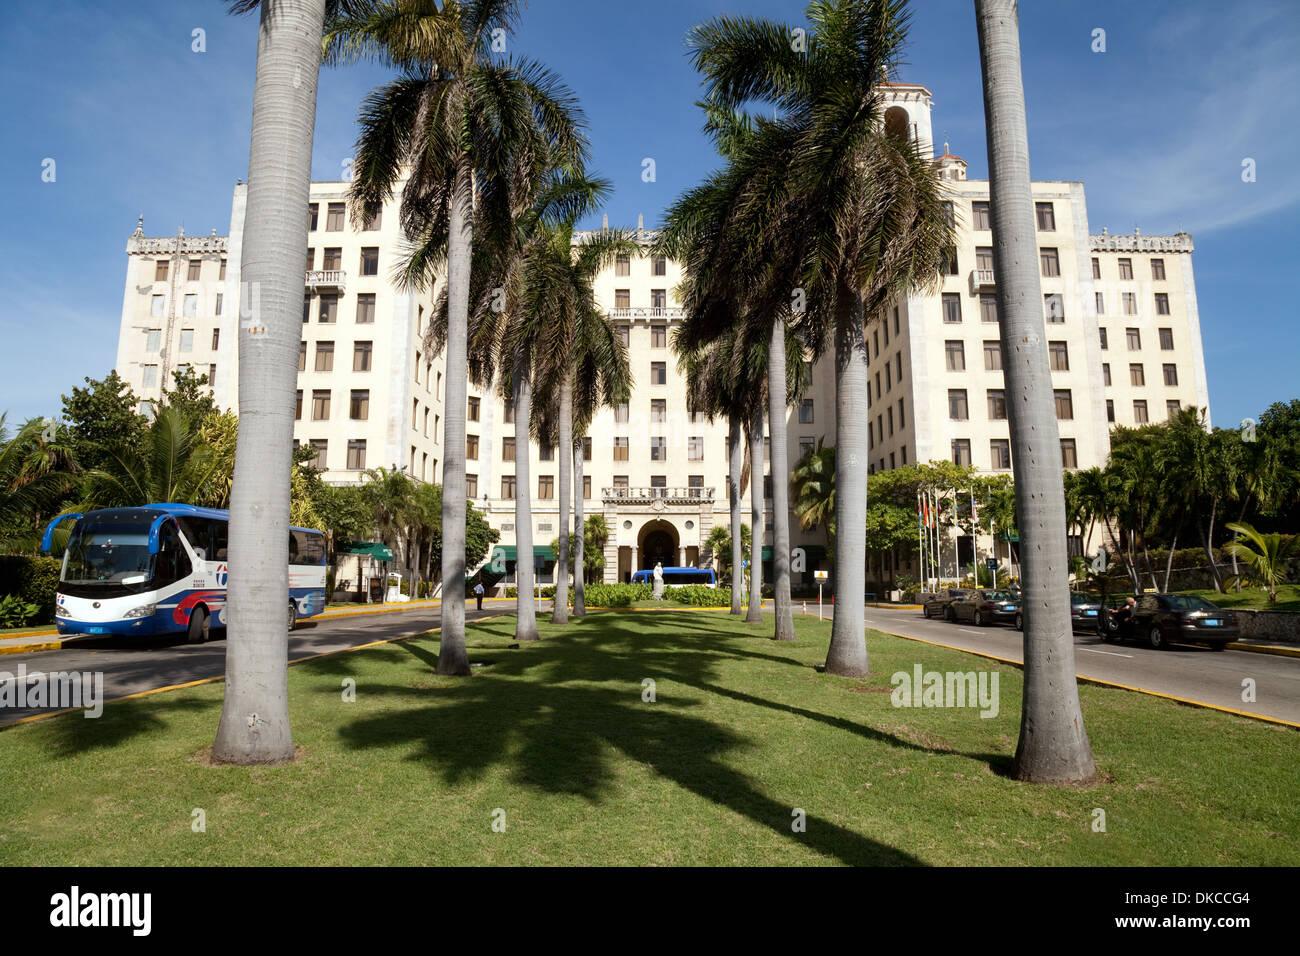 Hotel nacional luxury hotel in havana cuba caribbean